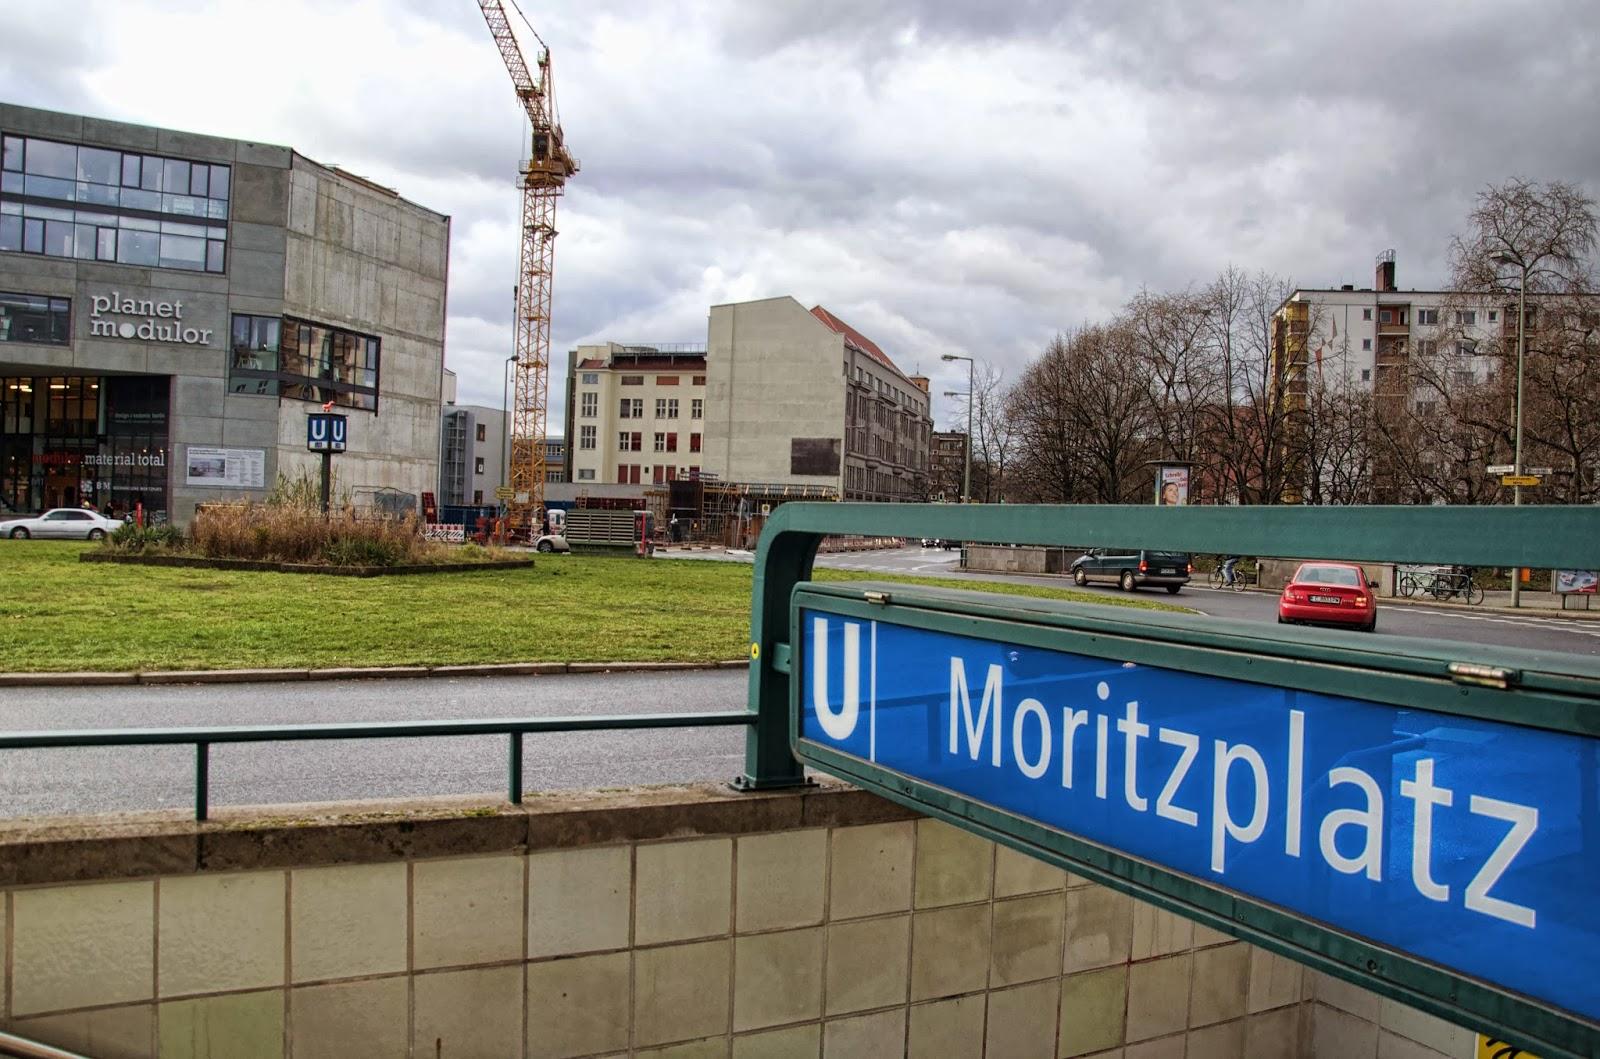 berliner baustellen 0234 baustelle erweiterung aufbau haus planet modulor moritzplatz. Black Bedroom Furniture Sets. Home Design Ideas